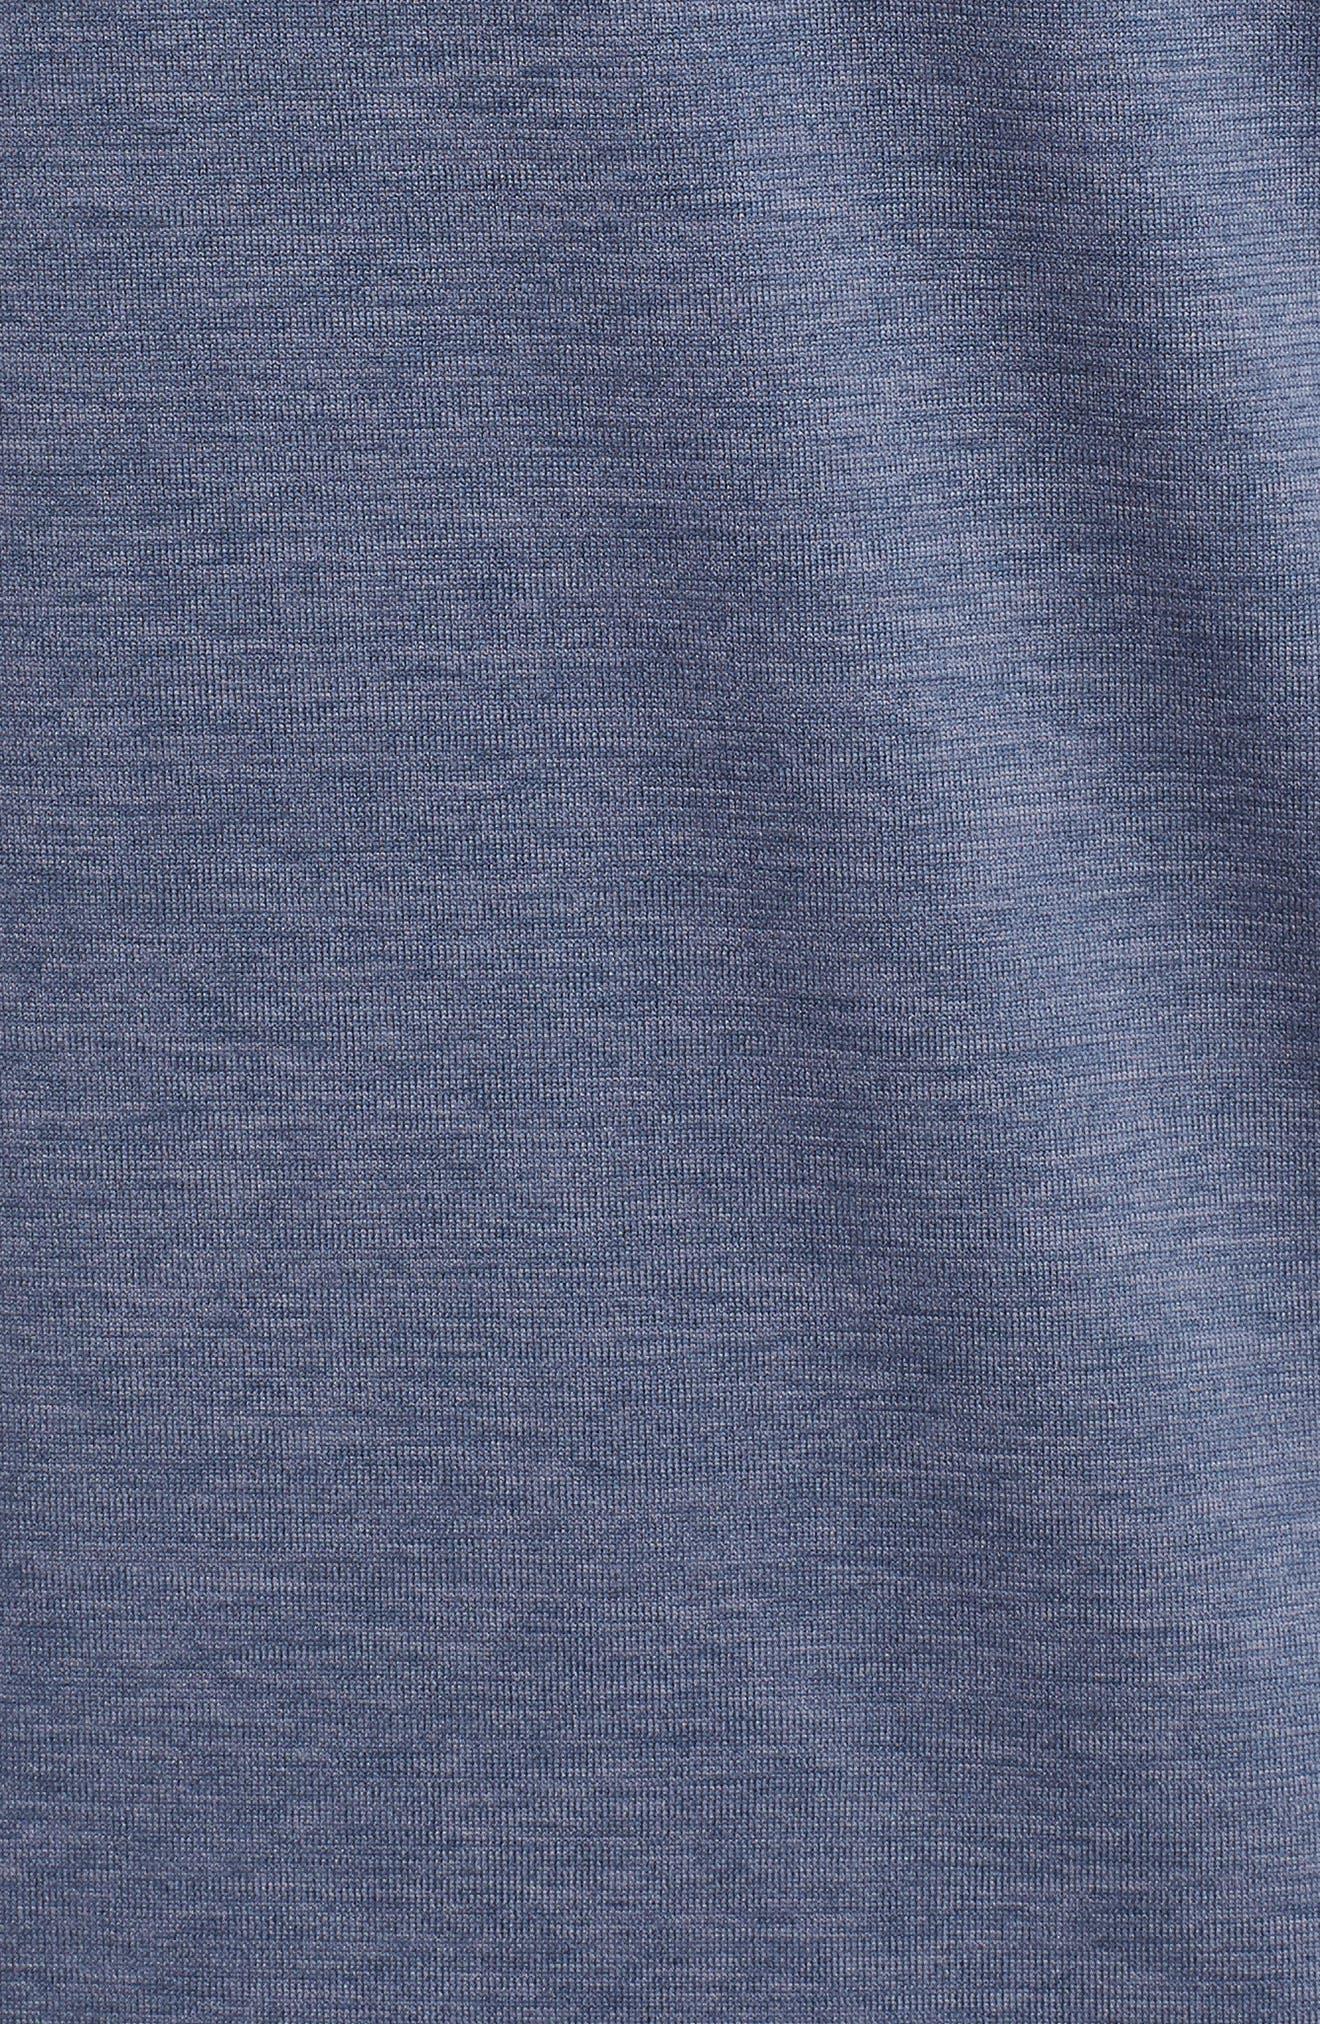 NIKE,                             Hyper Dry Regular Fit Training Hoodie,                             Alternate thumbnail 5, color,                             021